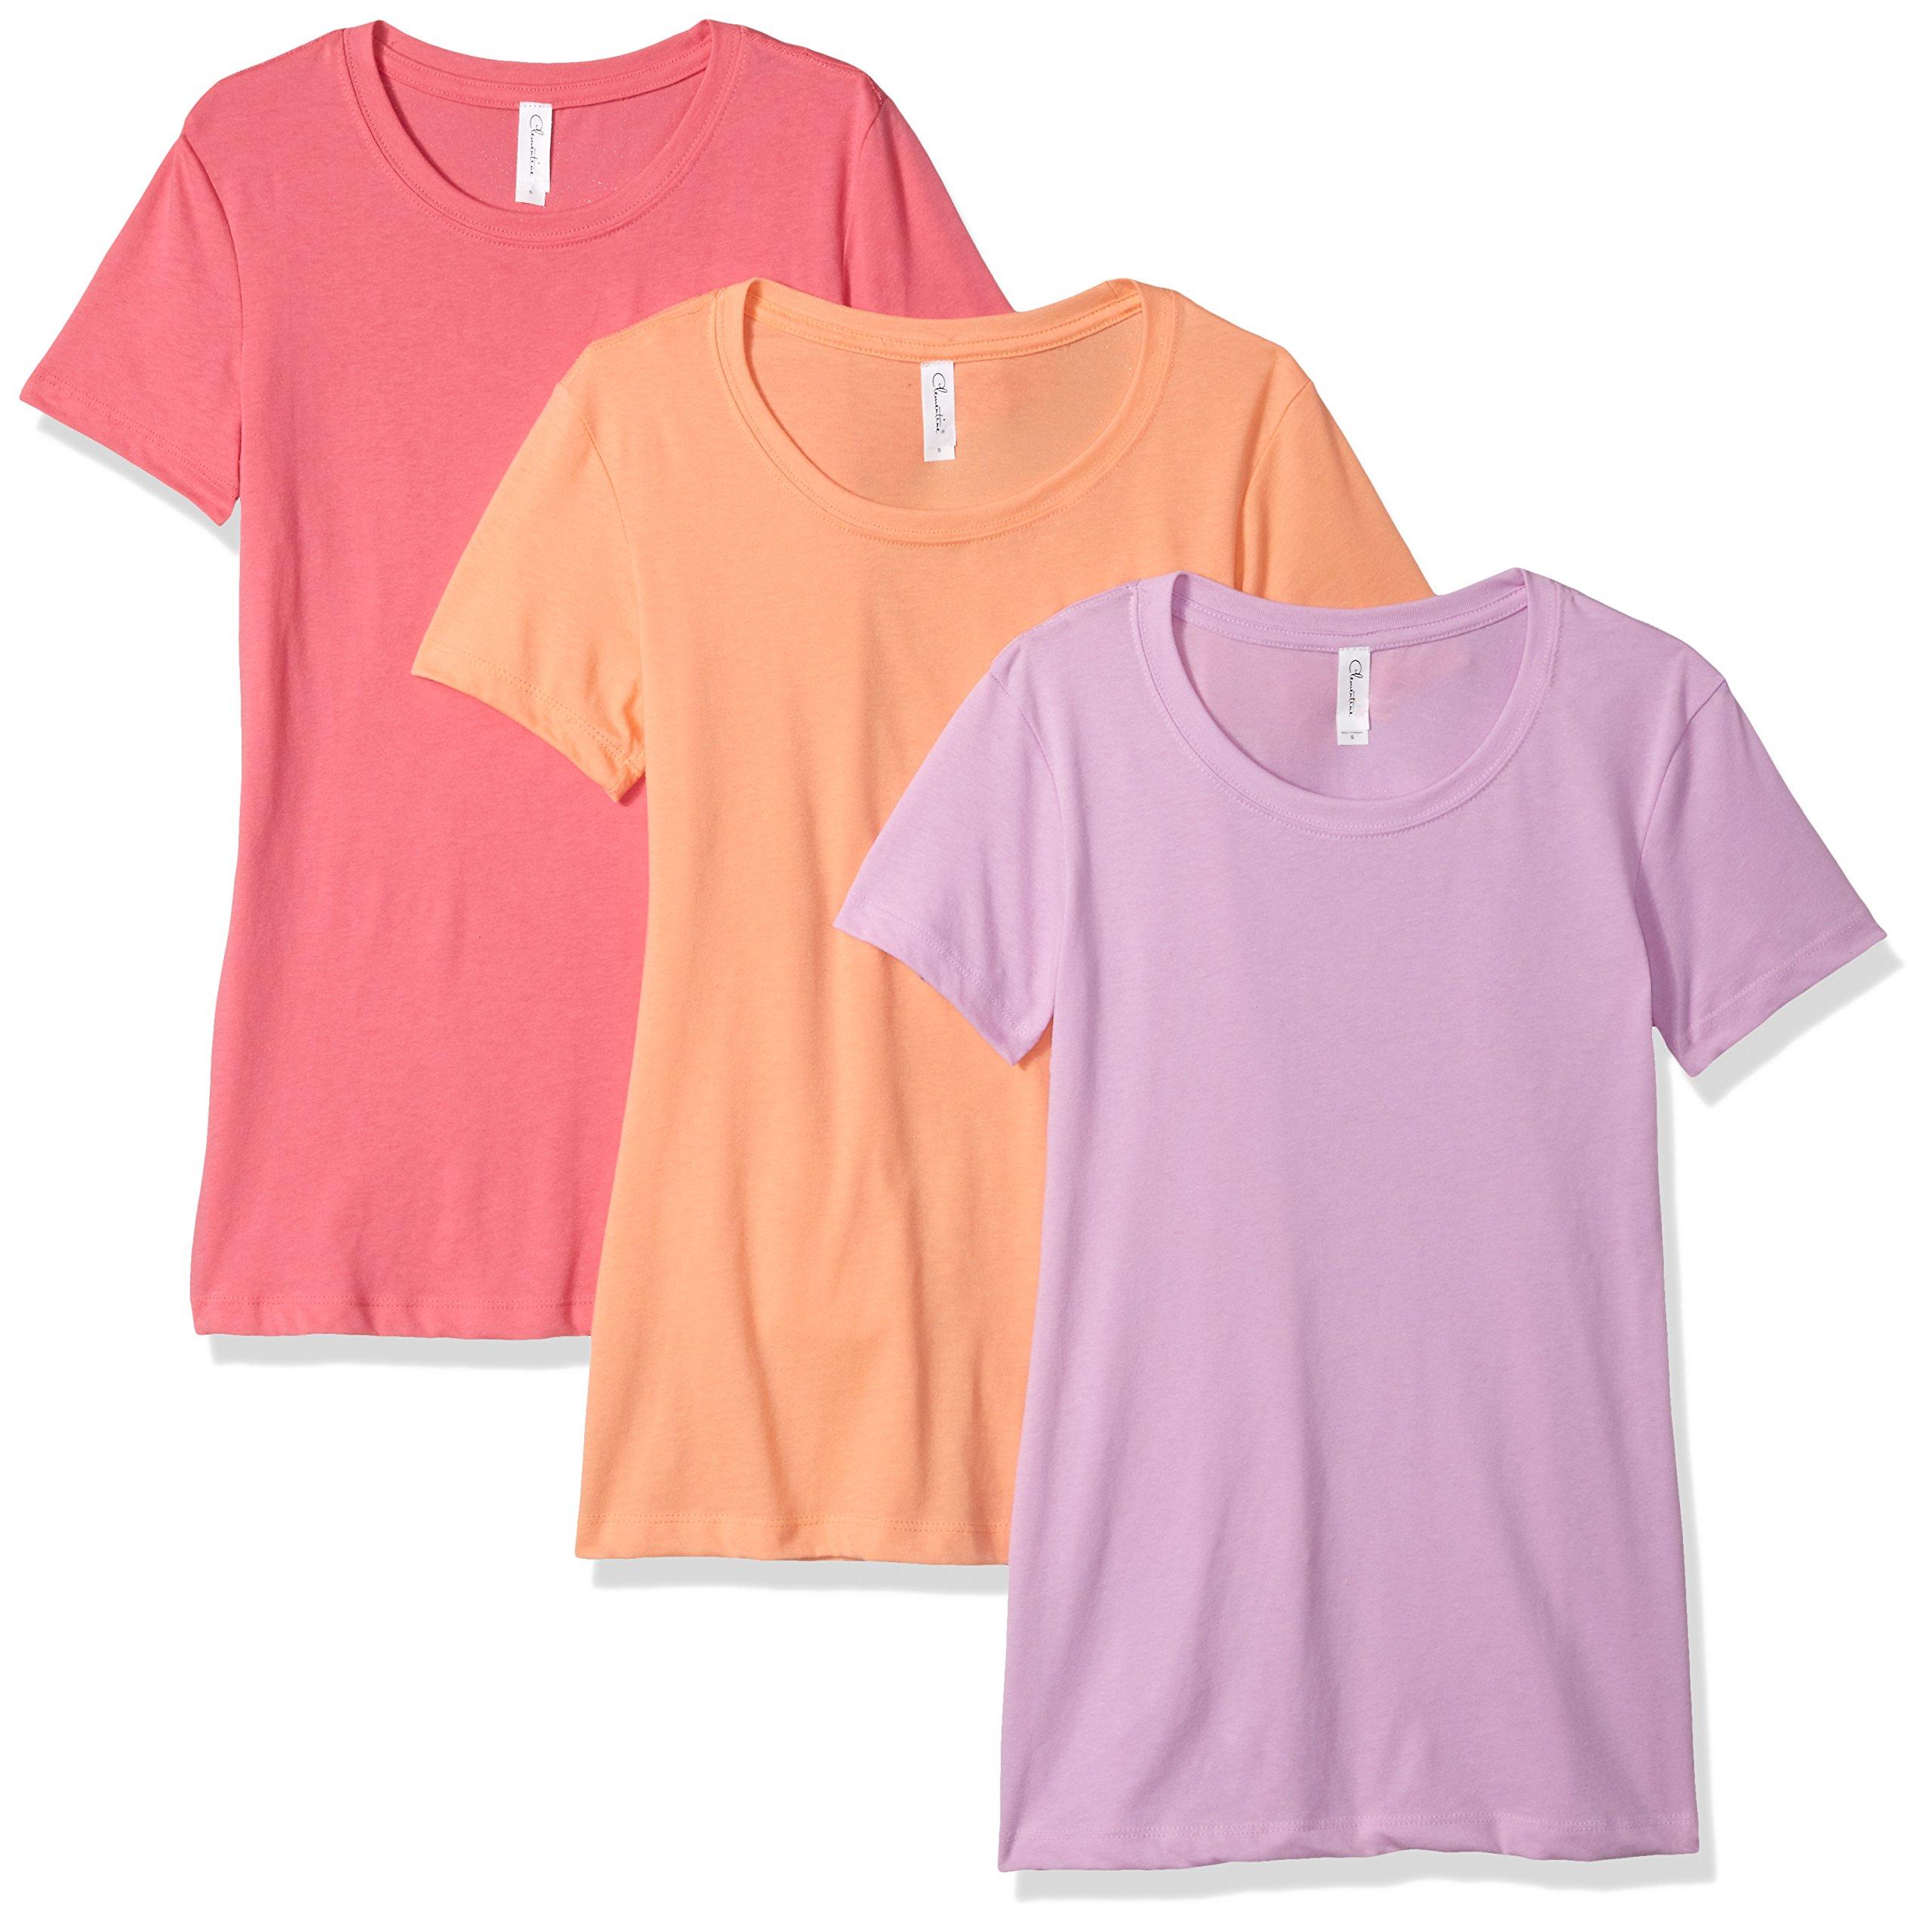 Clementine Apparel Women's Petite Plus Ideal Crew-Neck T-Shirts (Pack of 3), Hot Pink/Lilac/Light Orange, L